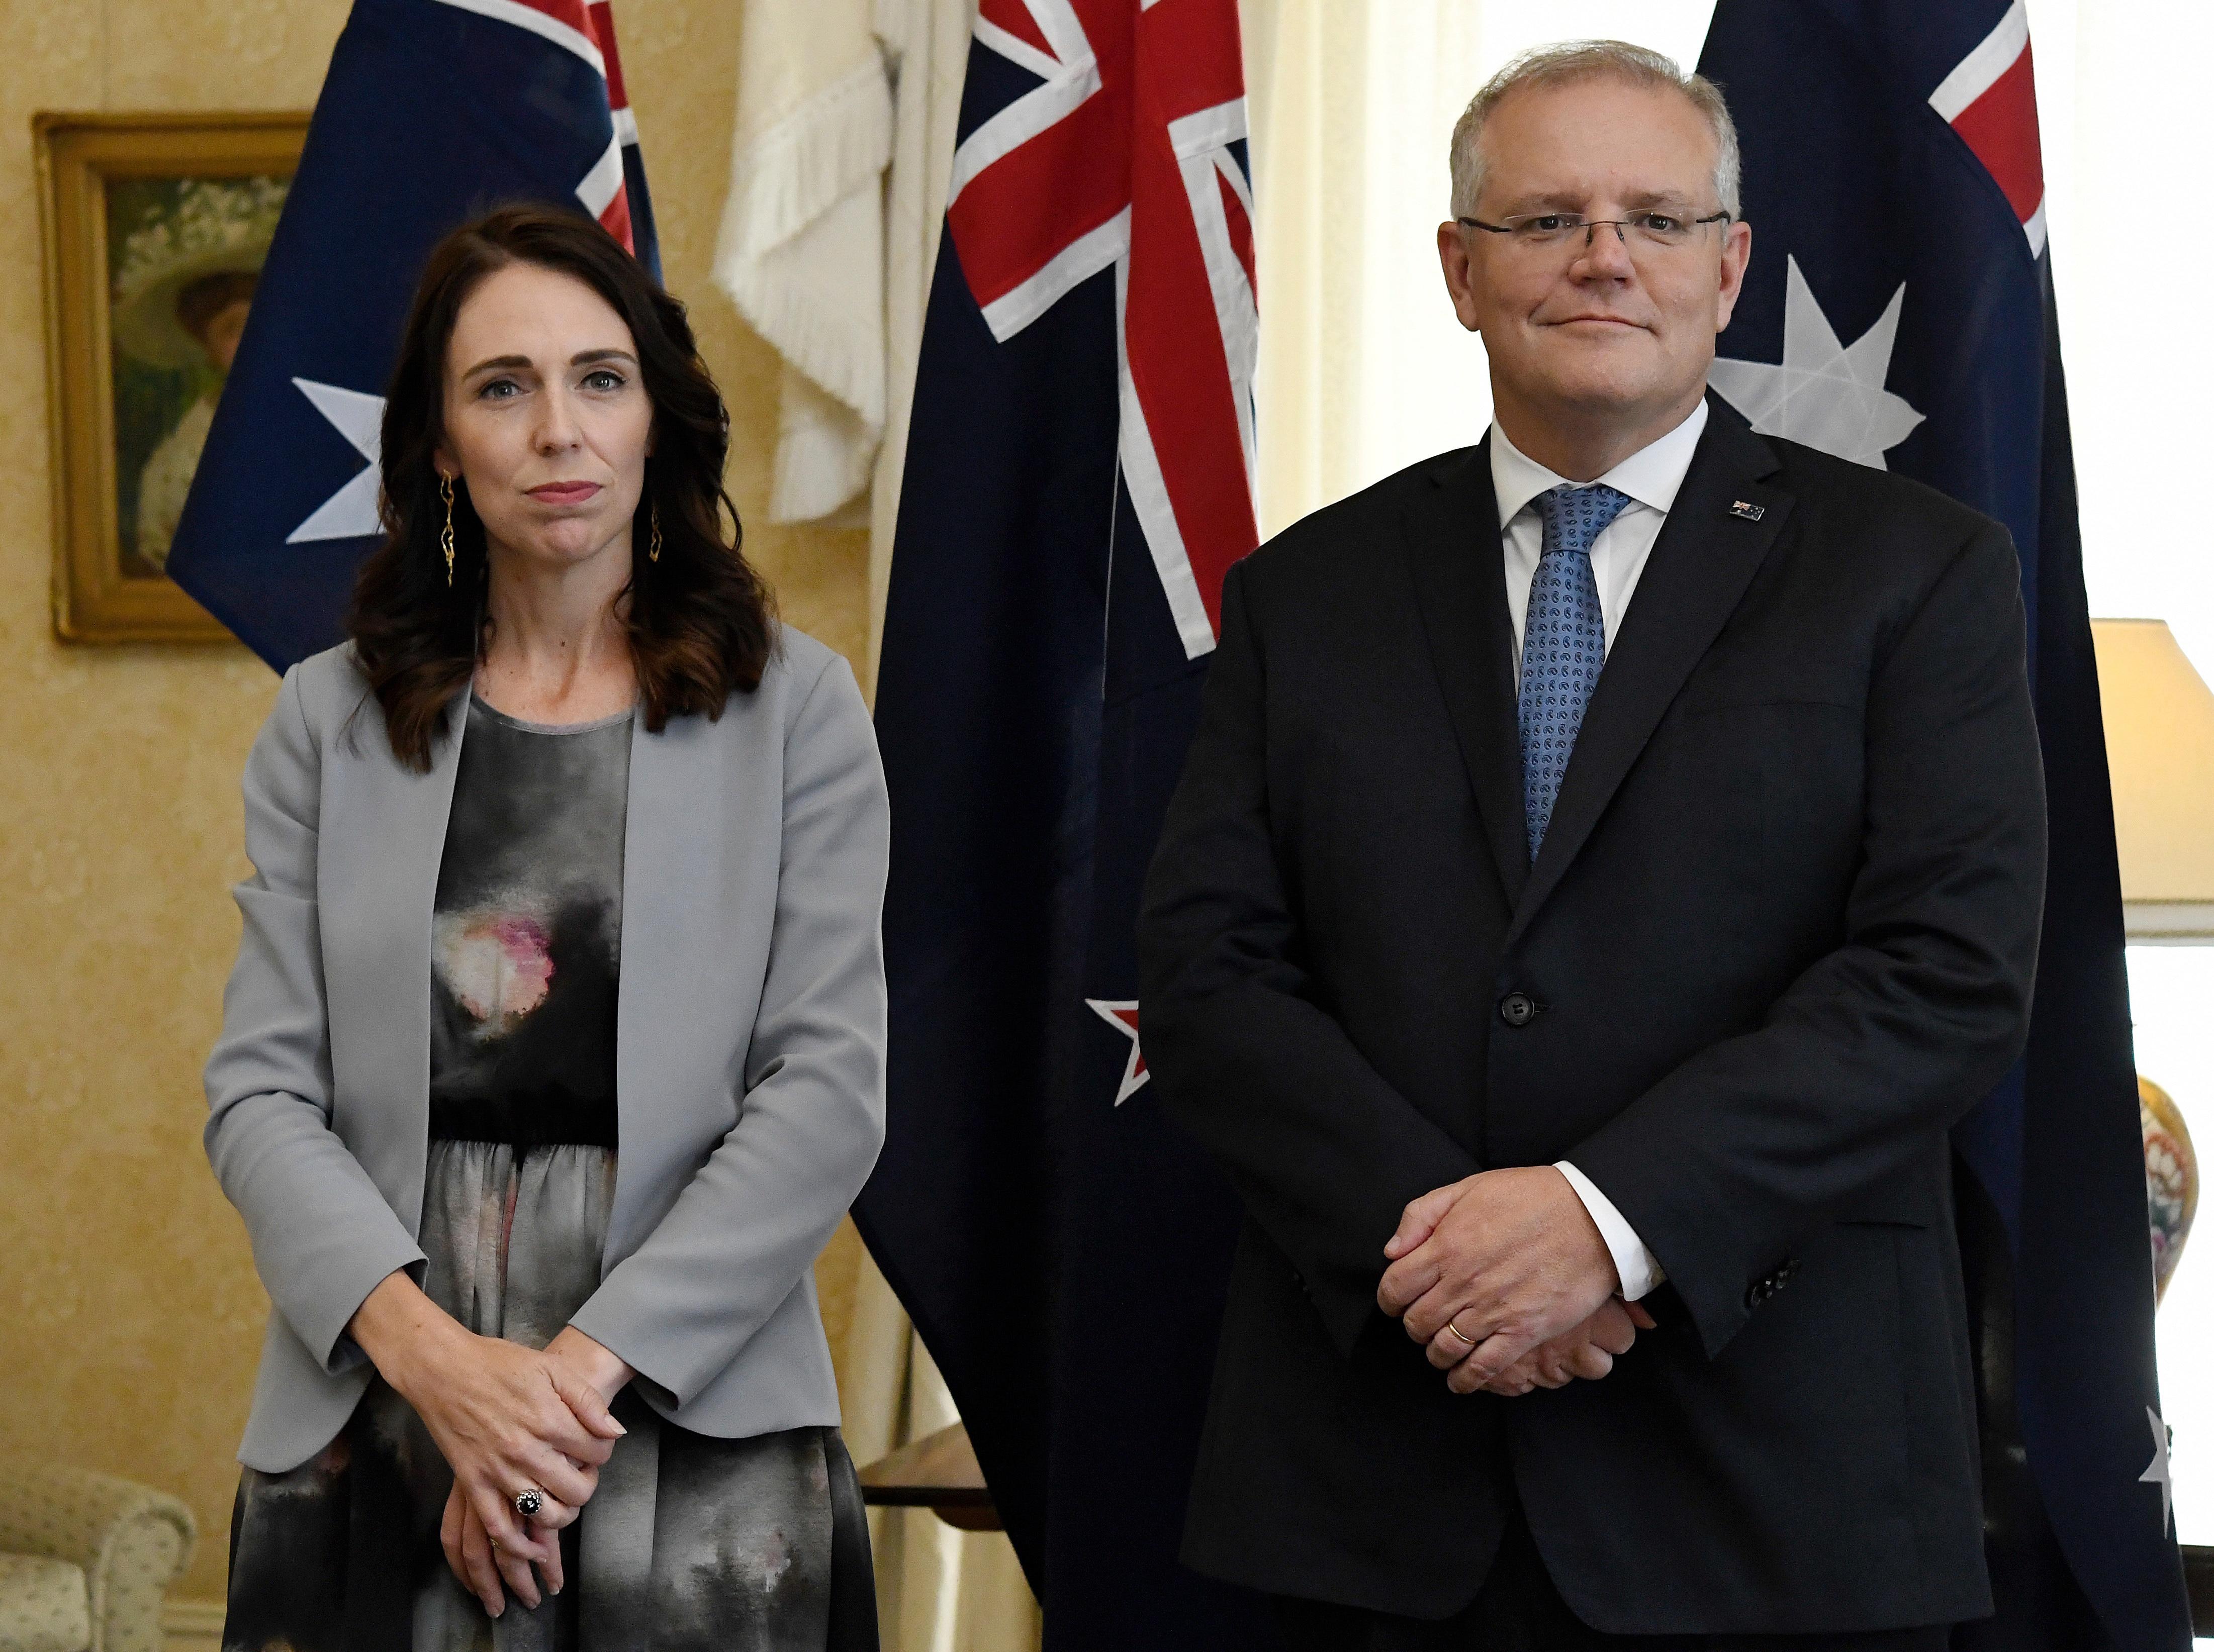 NZ Prime Minister Jacinda Ardern will join Australian PM Scott Morrison in Tuesday's National Cabinet meeting.